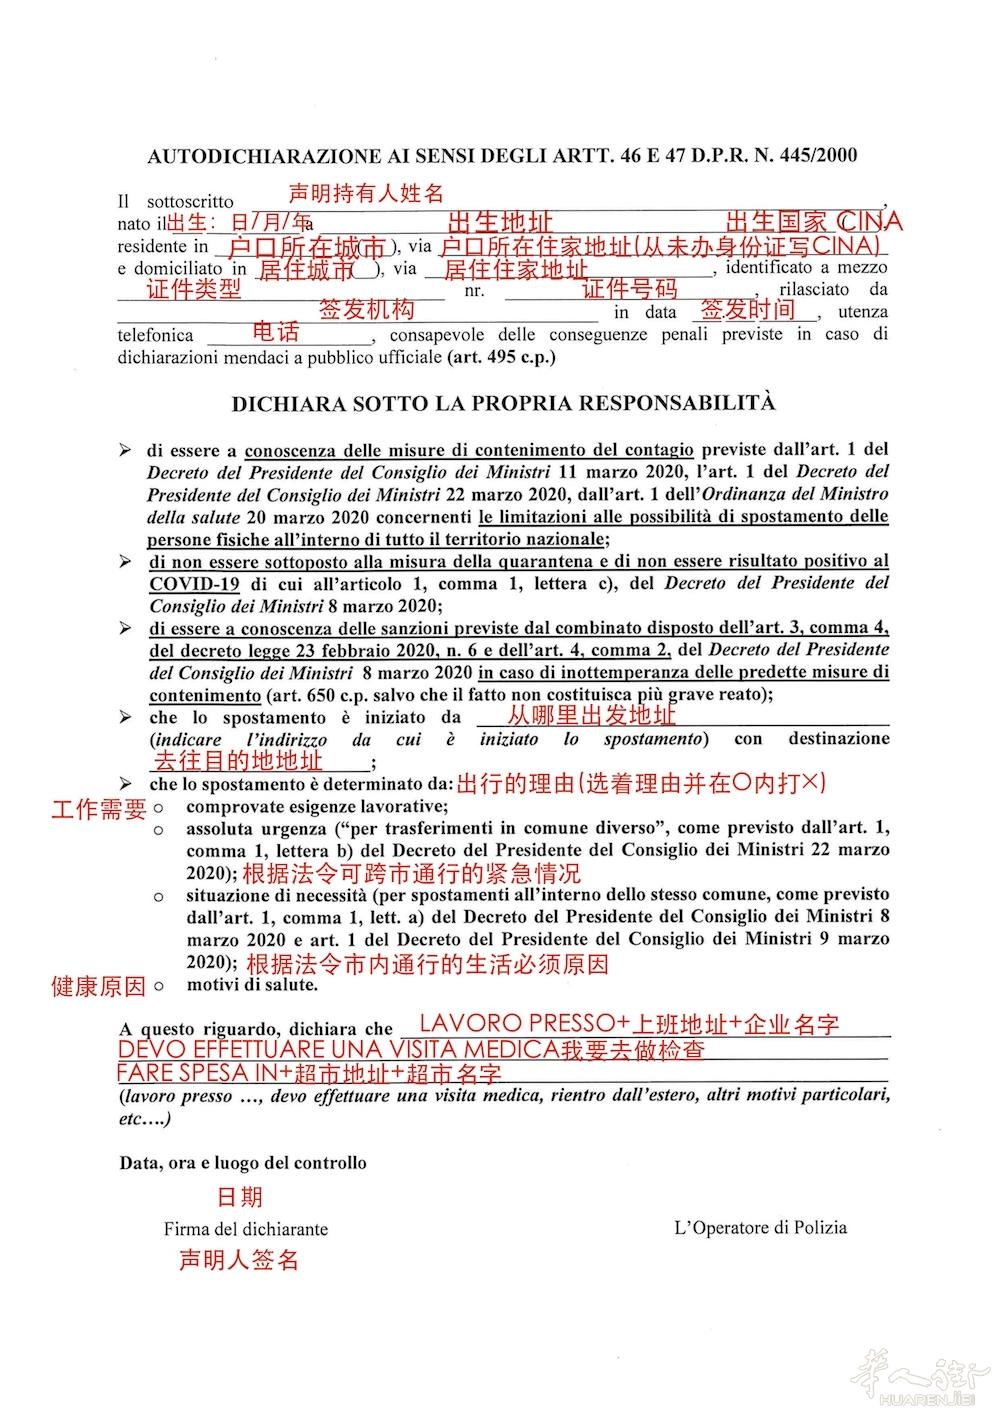 """Nuova autocertificazione coronavirus_23194904""的副本.jpg"